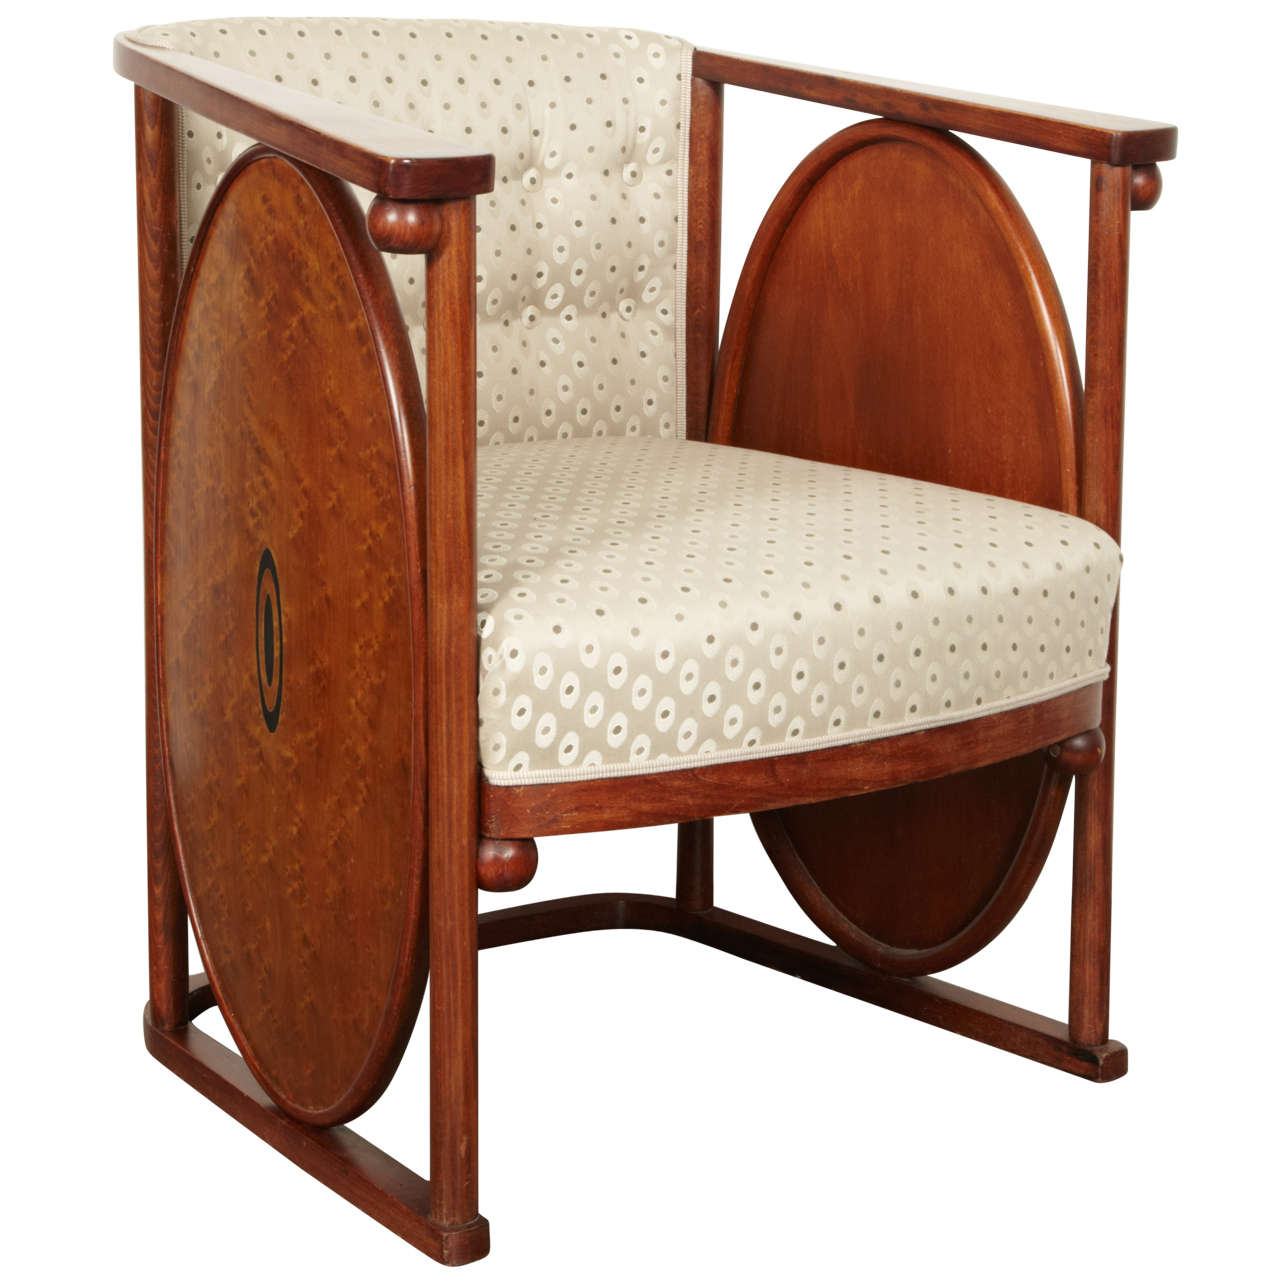 Koloman moser and josef hoffmann art nouveau armchair for for Artistic chairs